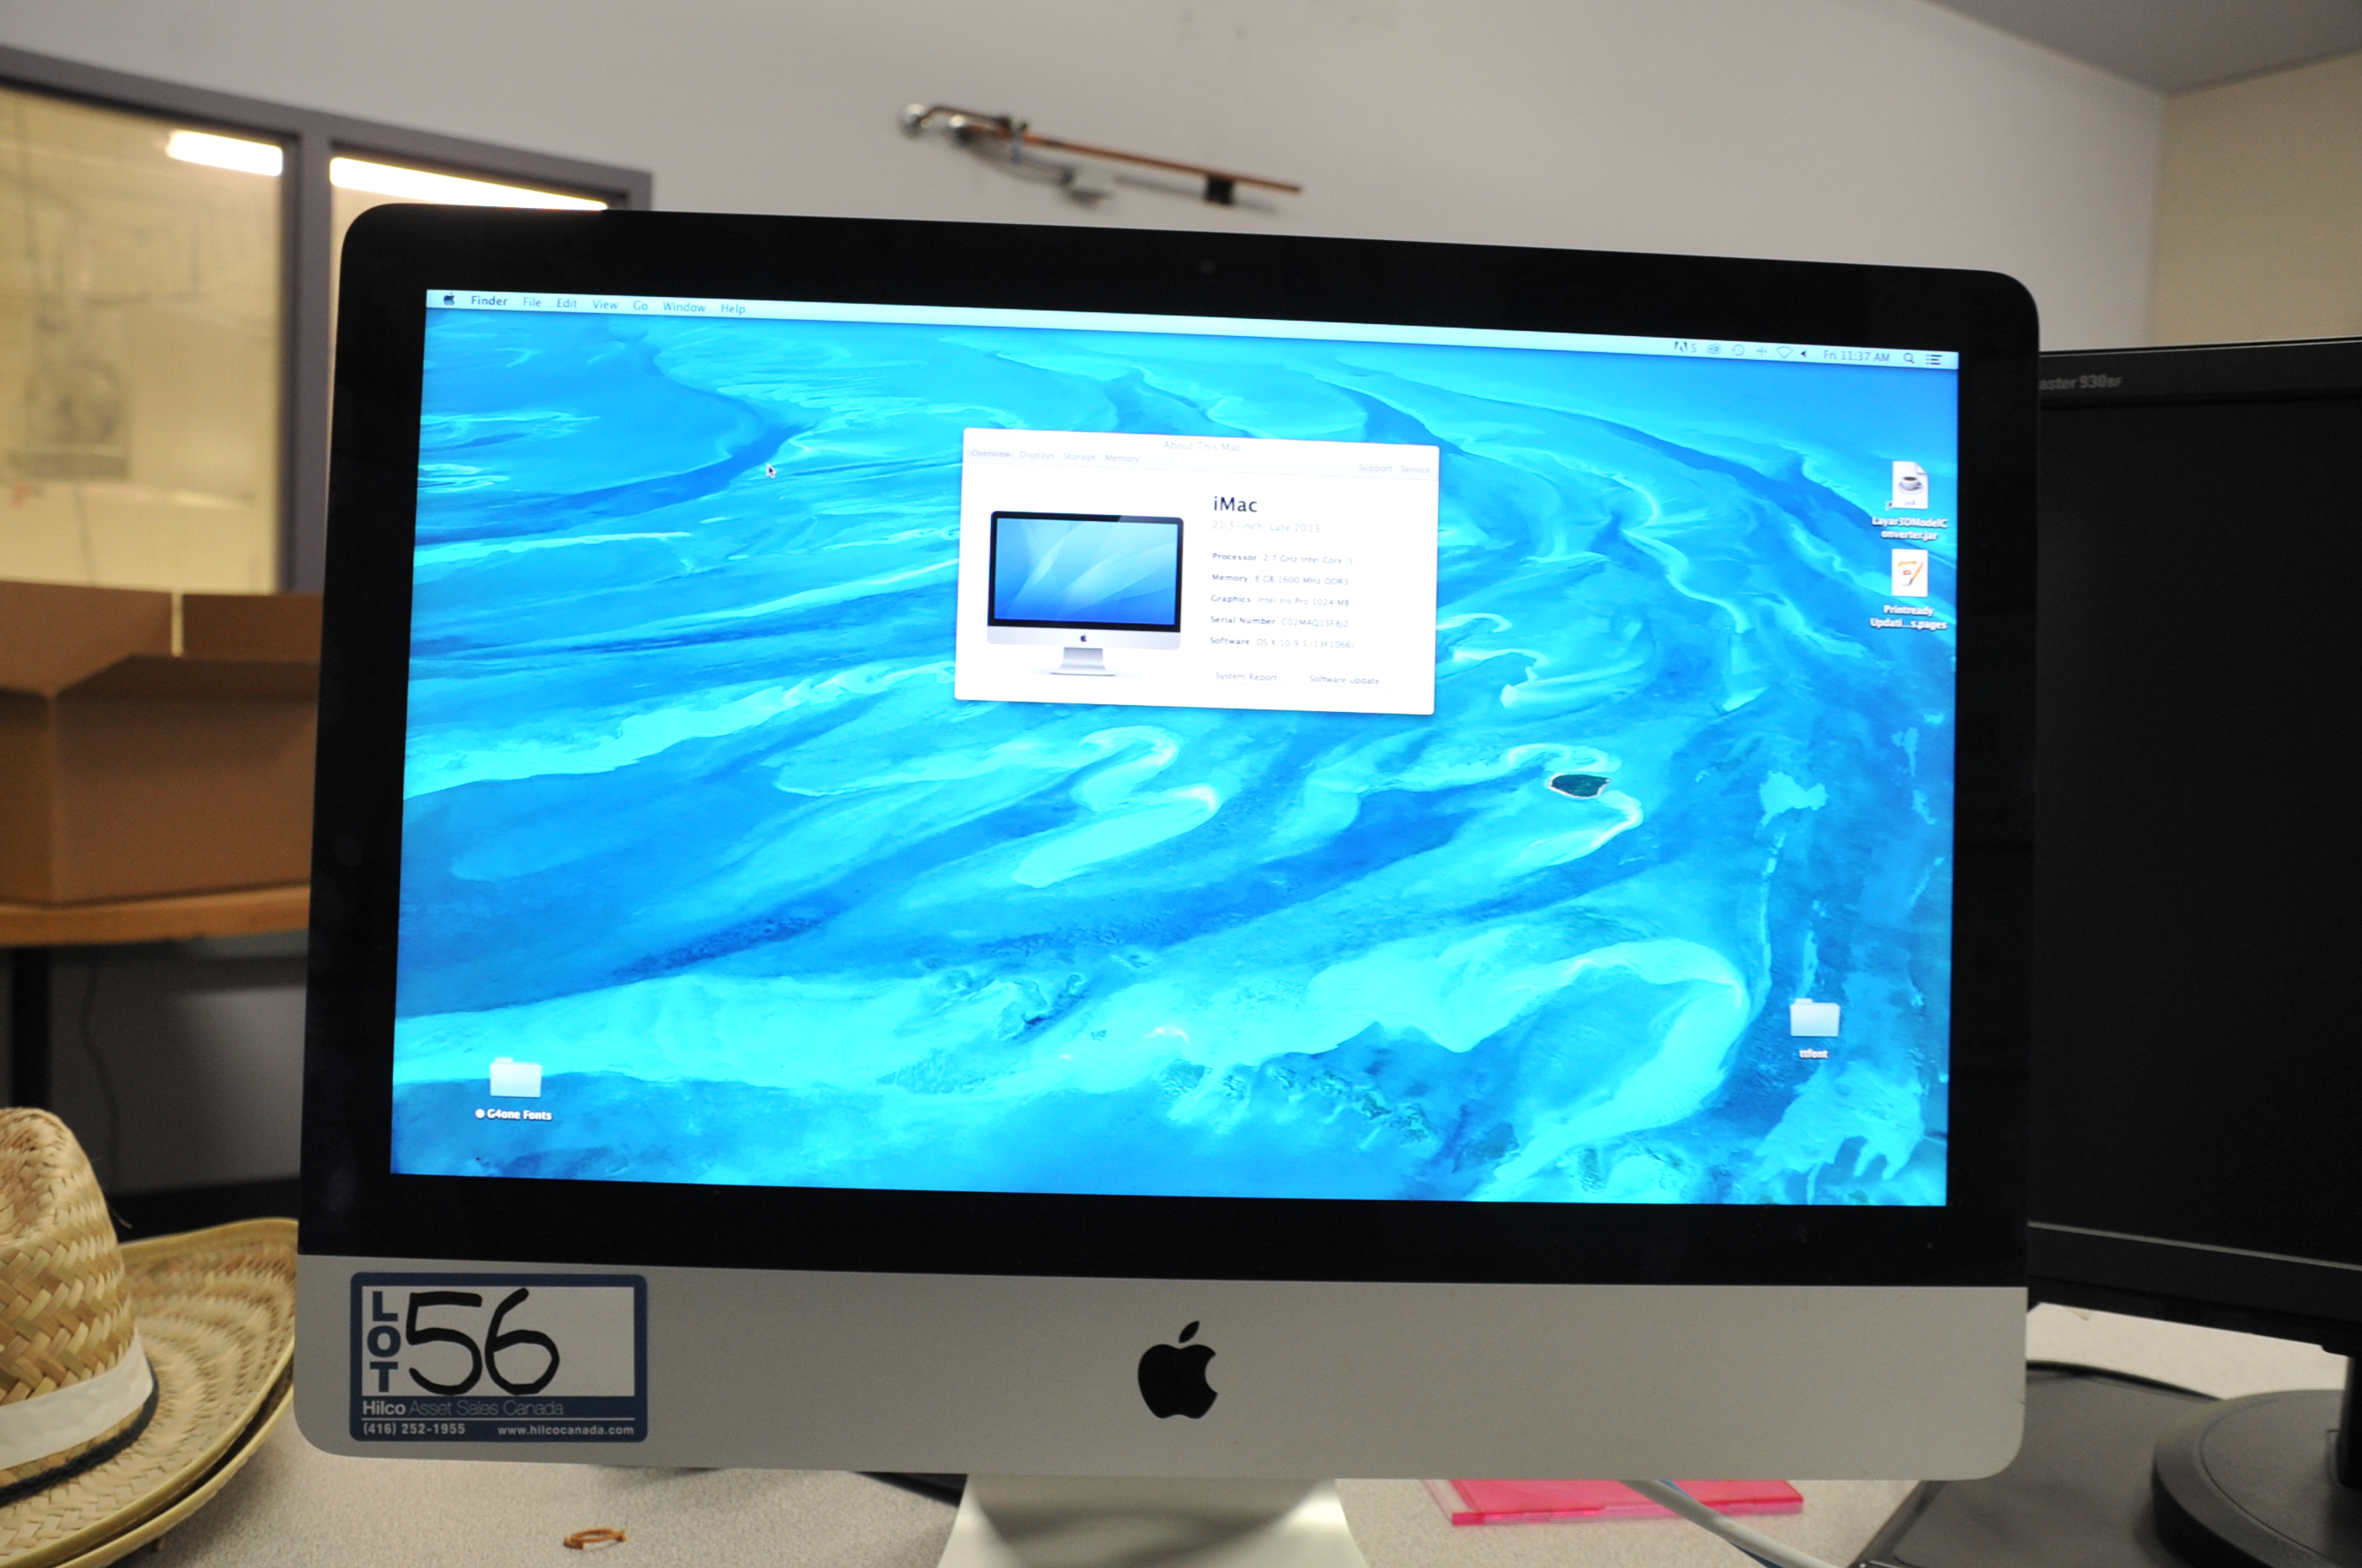 iMac Model A1418 2.7Gz Core I5, 8Gb, 1600Mhz, DDR3 Computer; Serial Number: C02M4Q15F8J2; Loaded